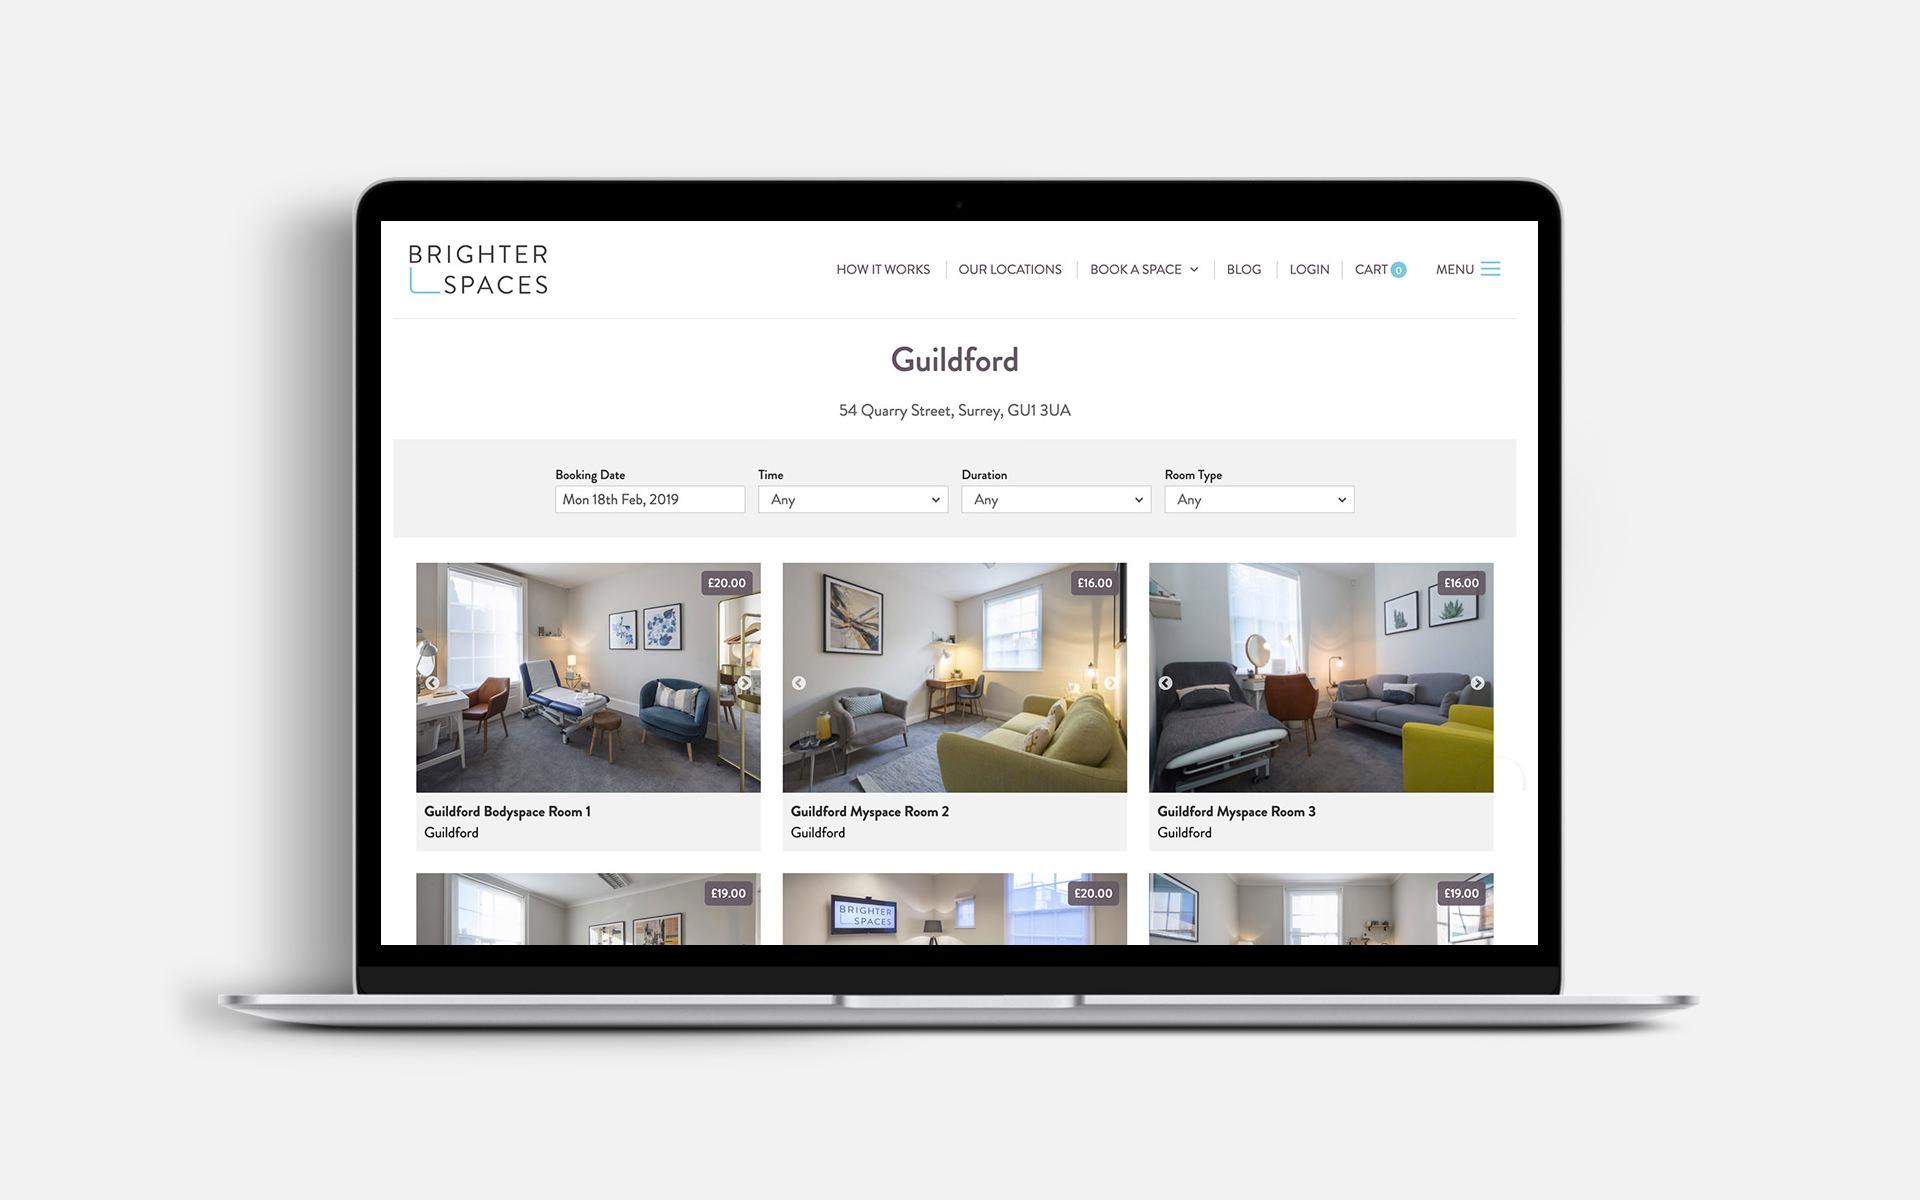 brighter-spaces-home-macbook-2